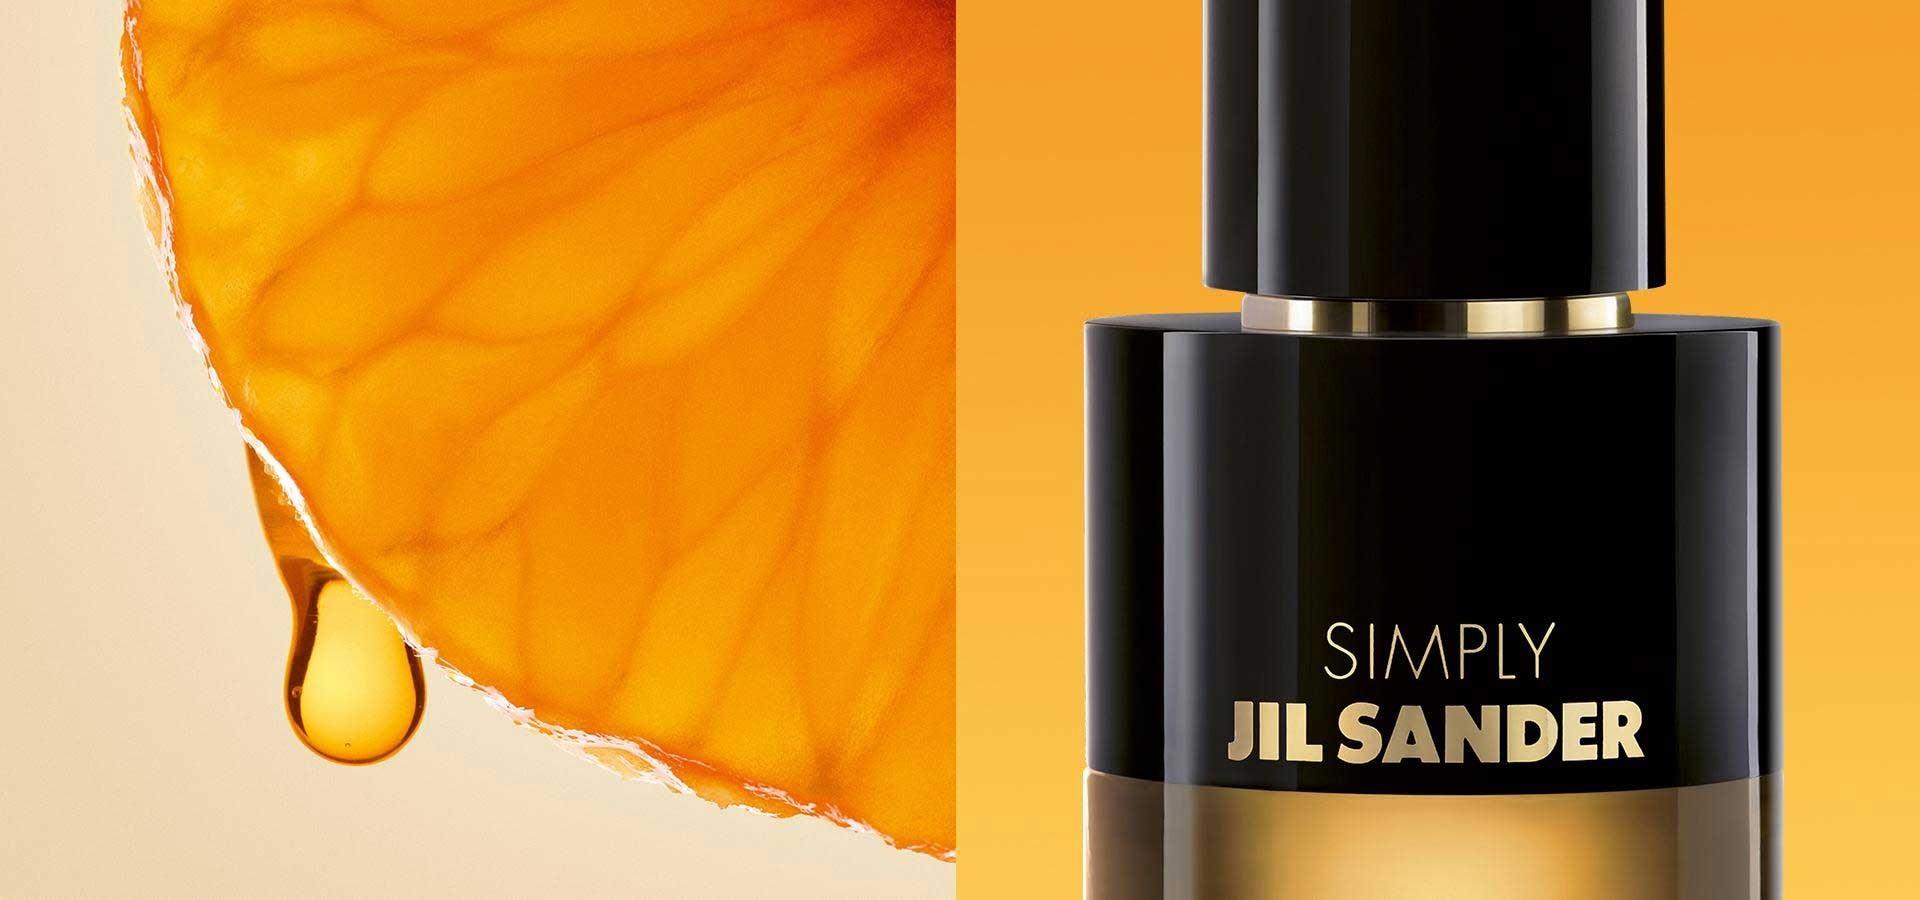 Simply Jil Sander Touch of Mandarin аромат для женщин